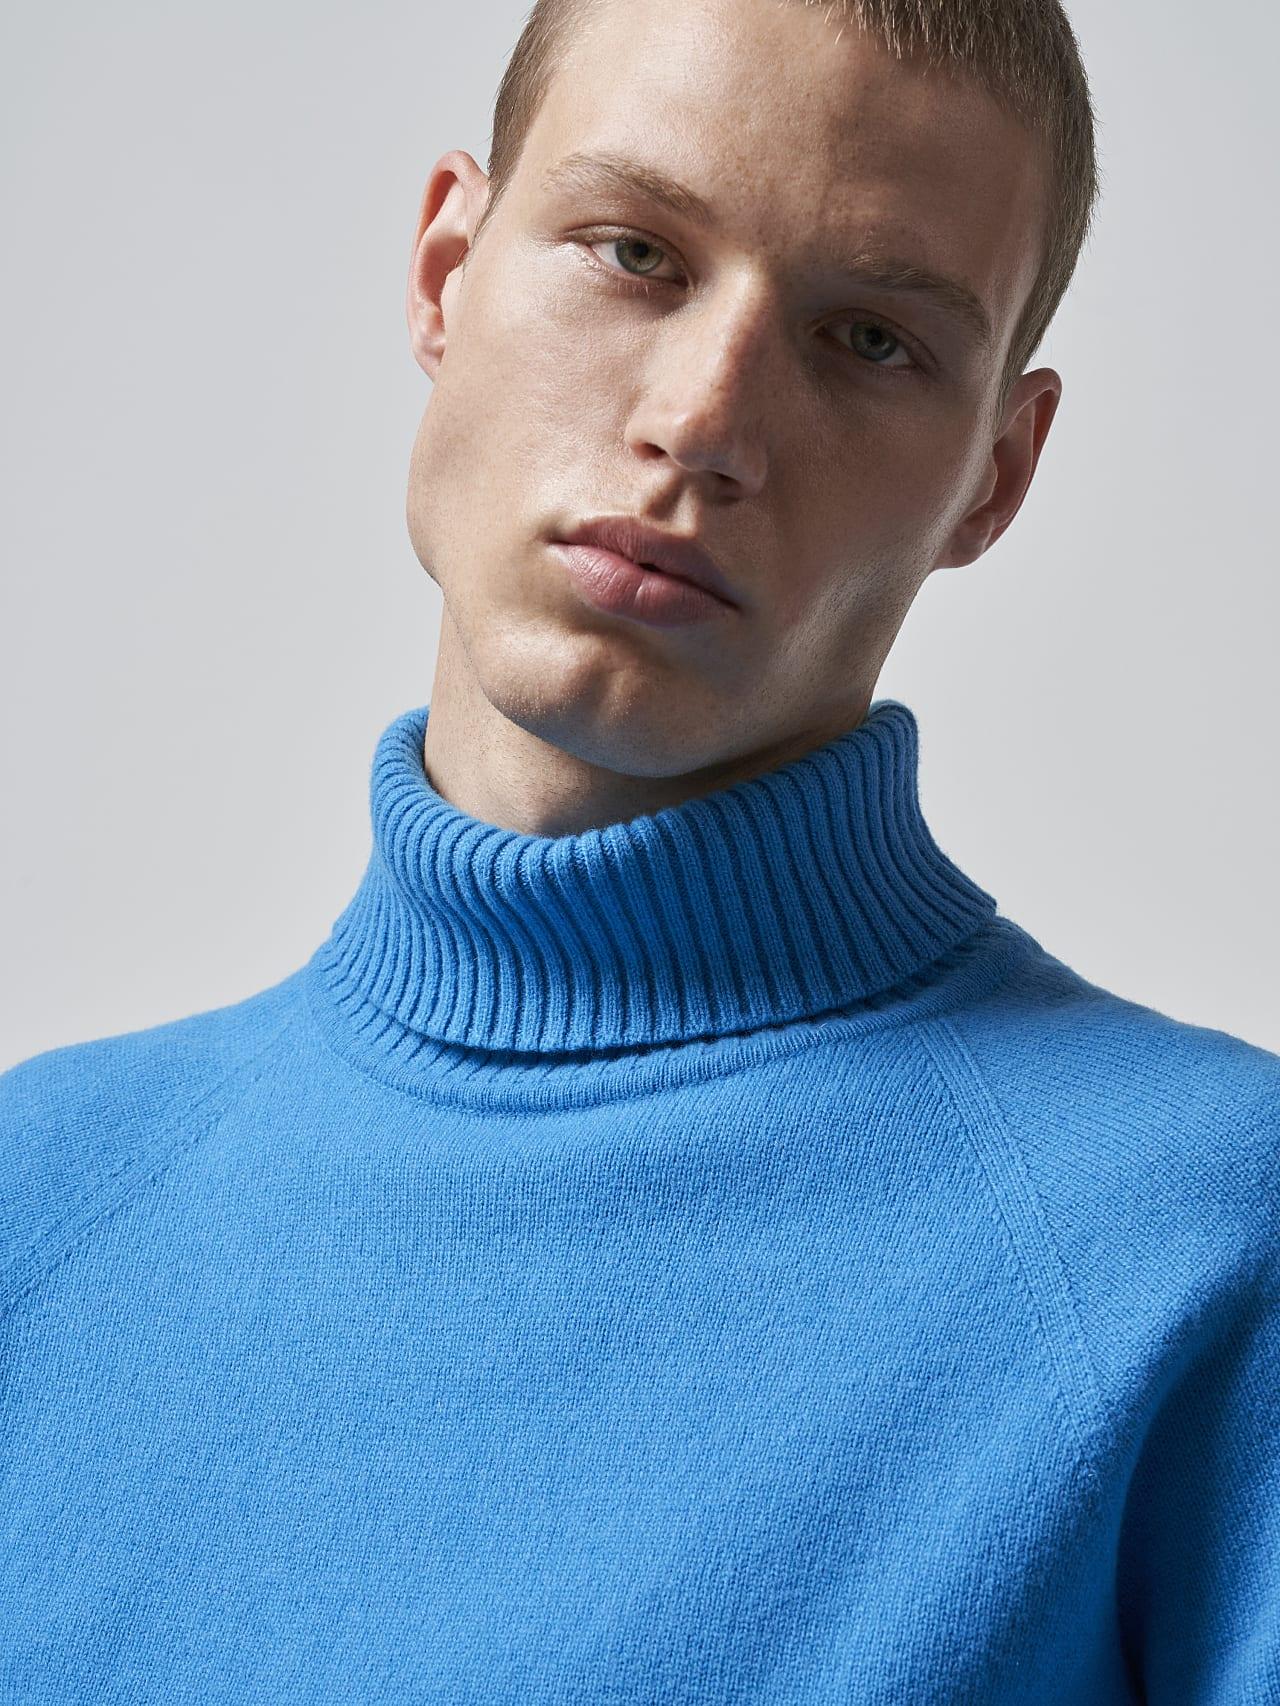 FLUCK V2.Y5.02 Seamless 3D Knit Cashmere-Blend Turtle Neck blue Right Alpha Tauri